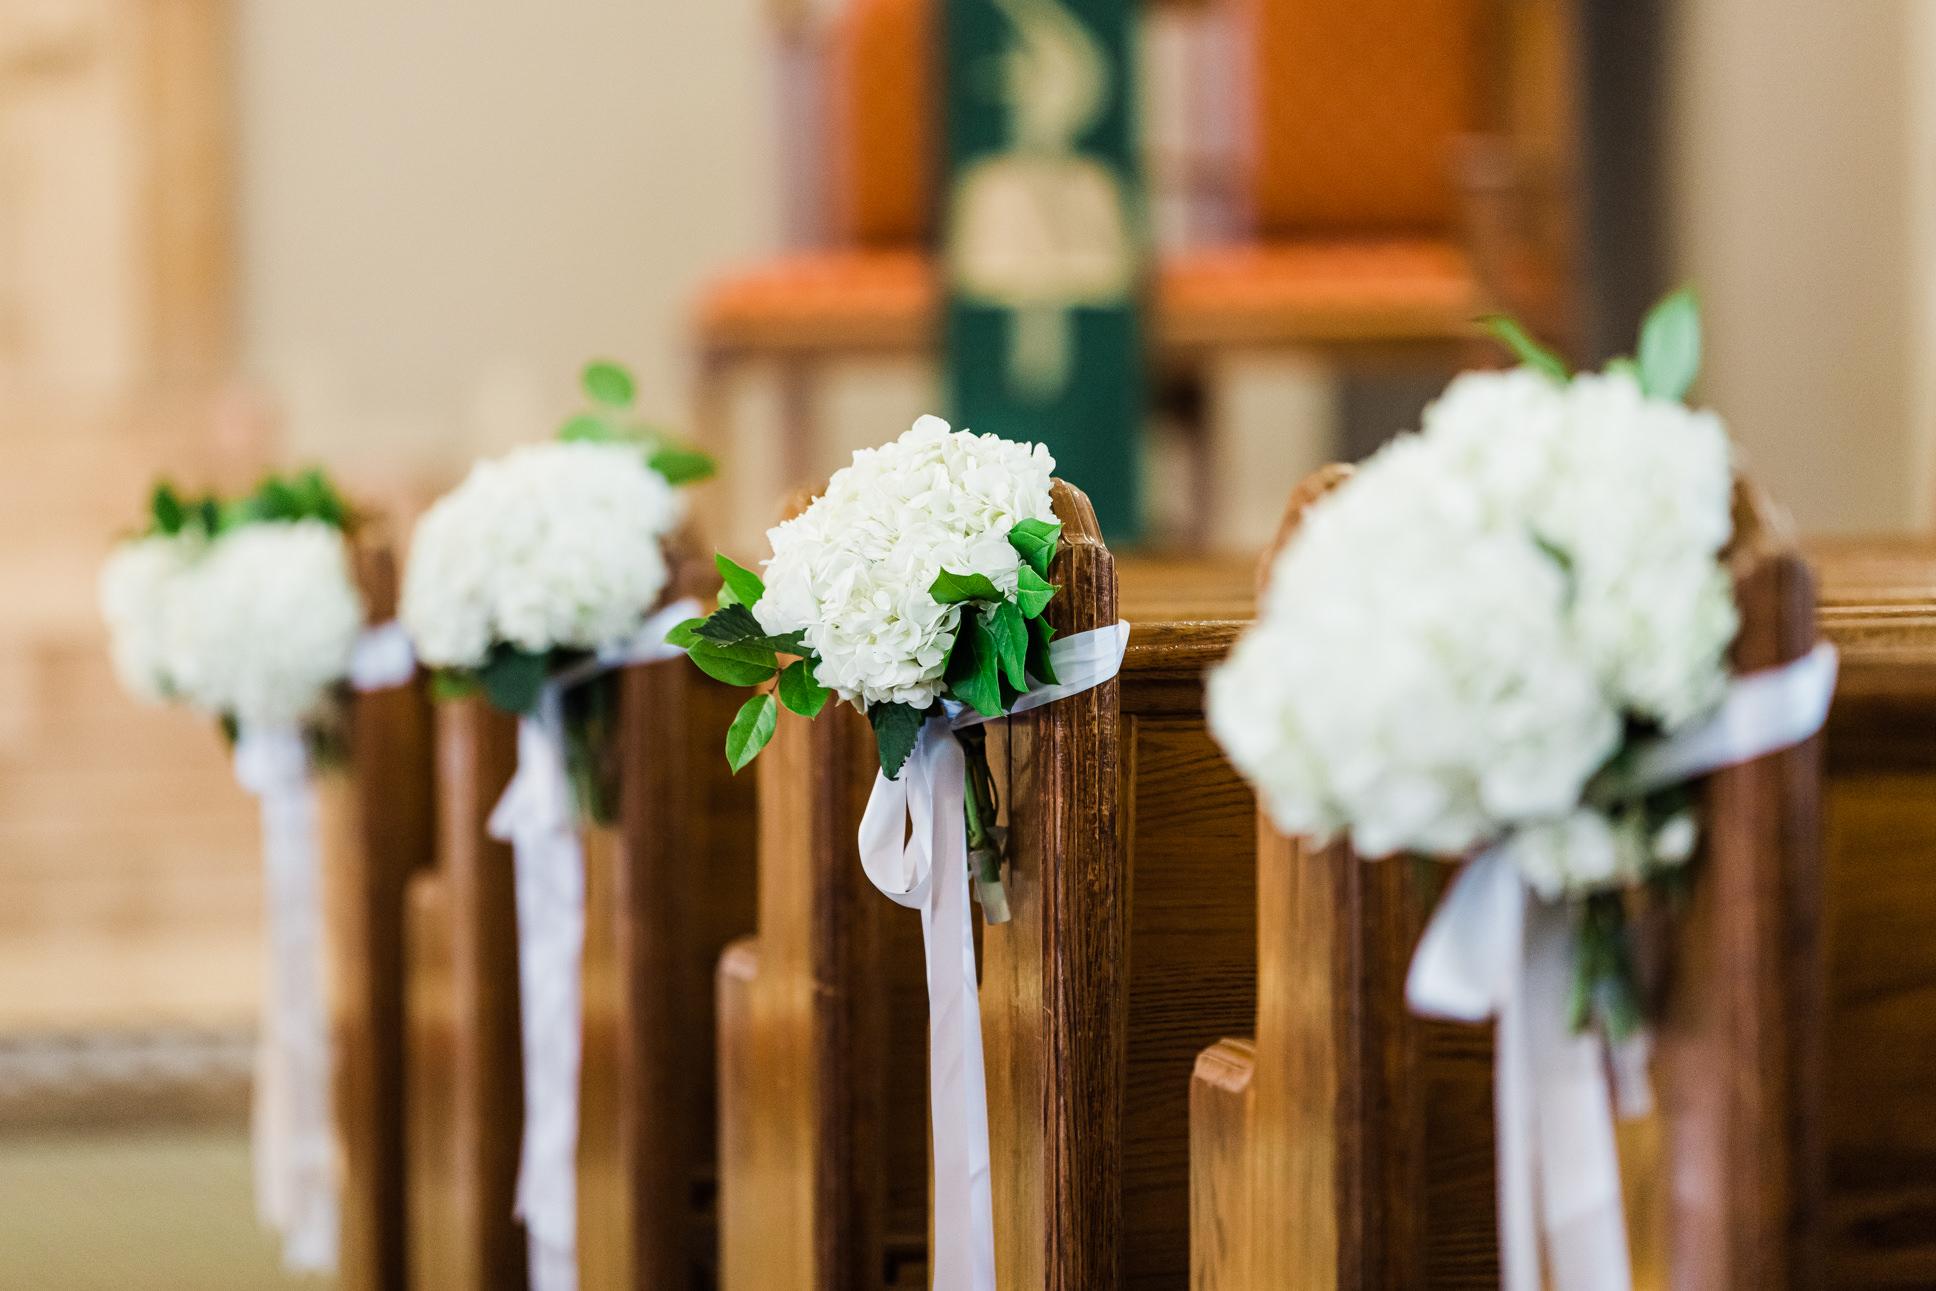 Classic Elegant Wedding Ceremony Decor, White Hydrangea Floral Arrangements on Church Benches